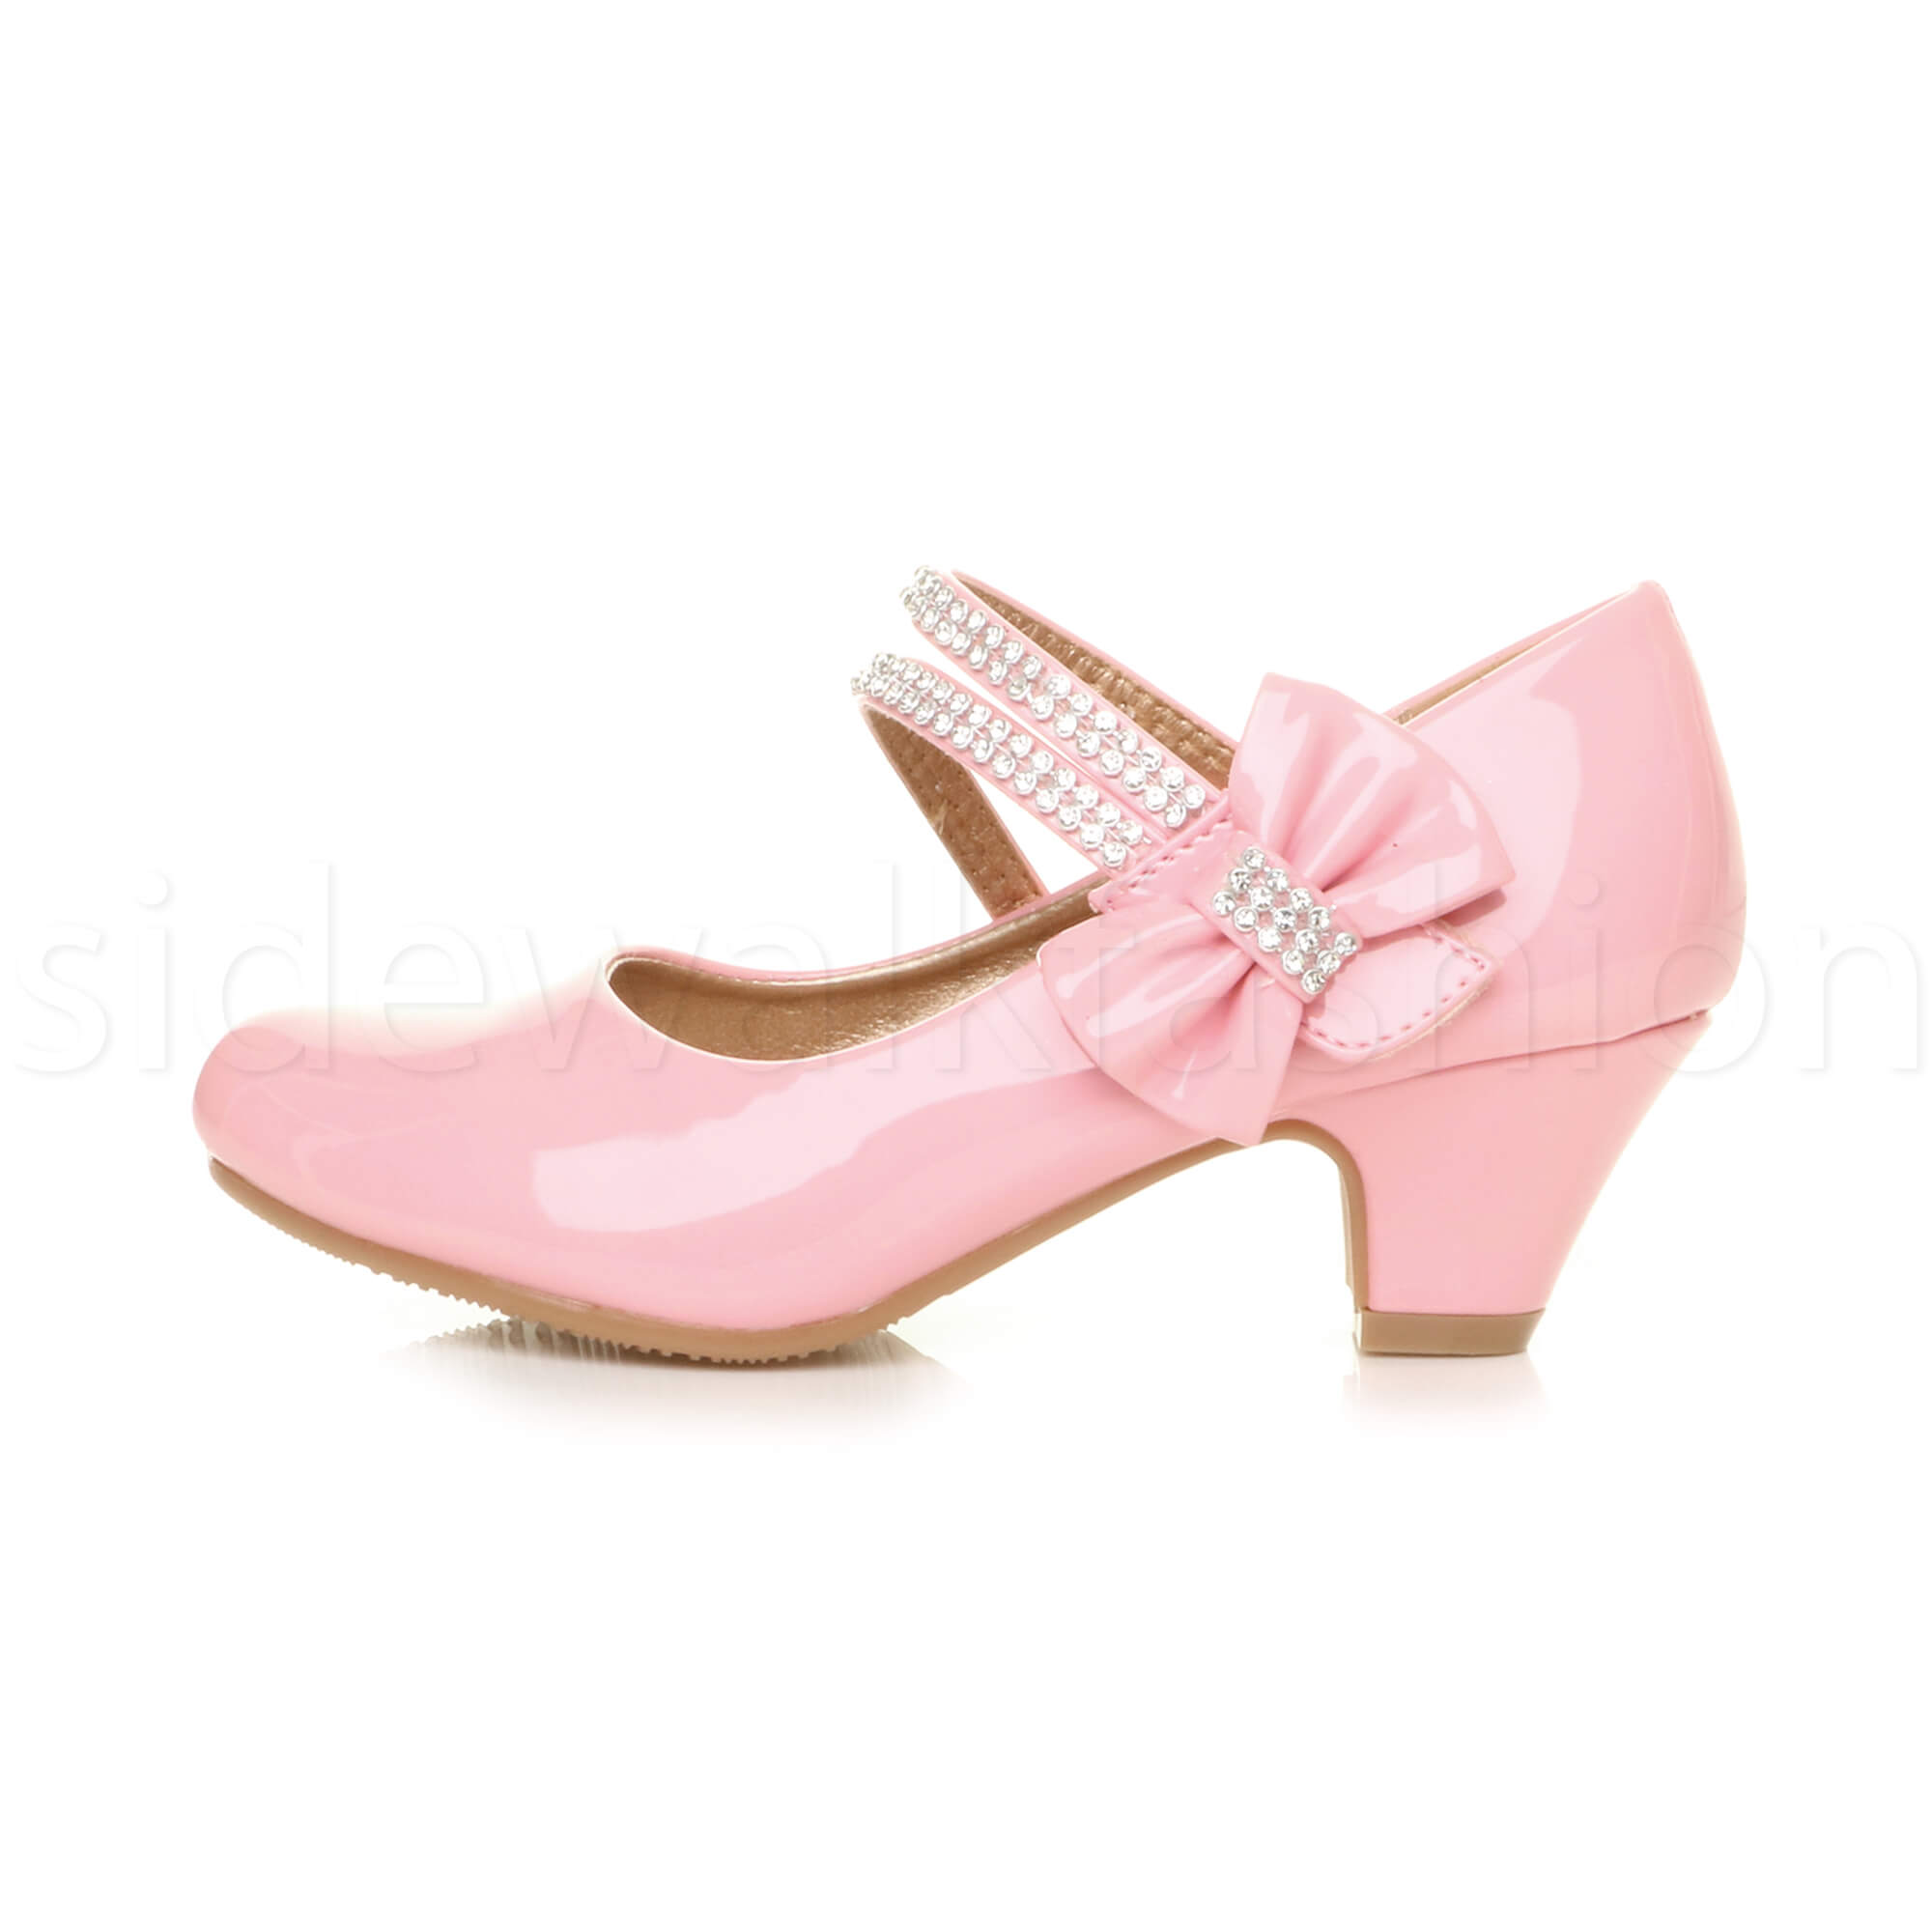 Girls kids childrens low heel party wedding mary jane sandals ...